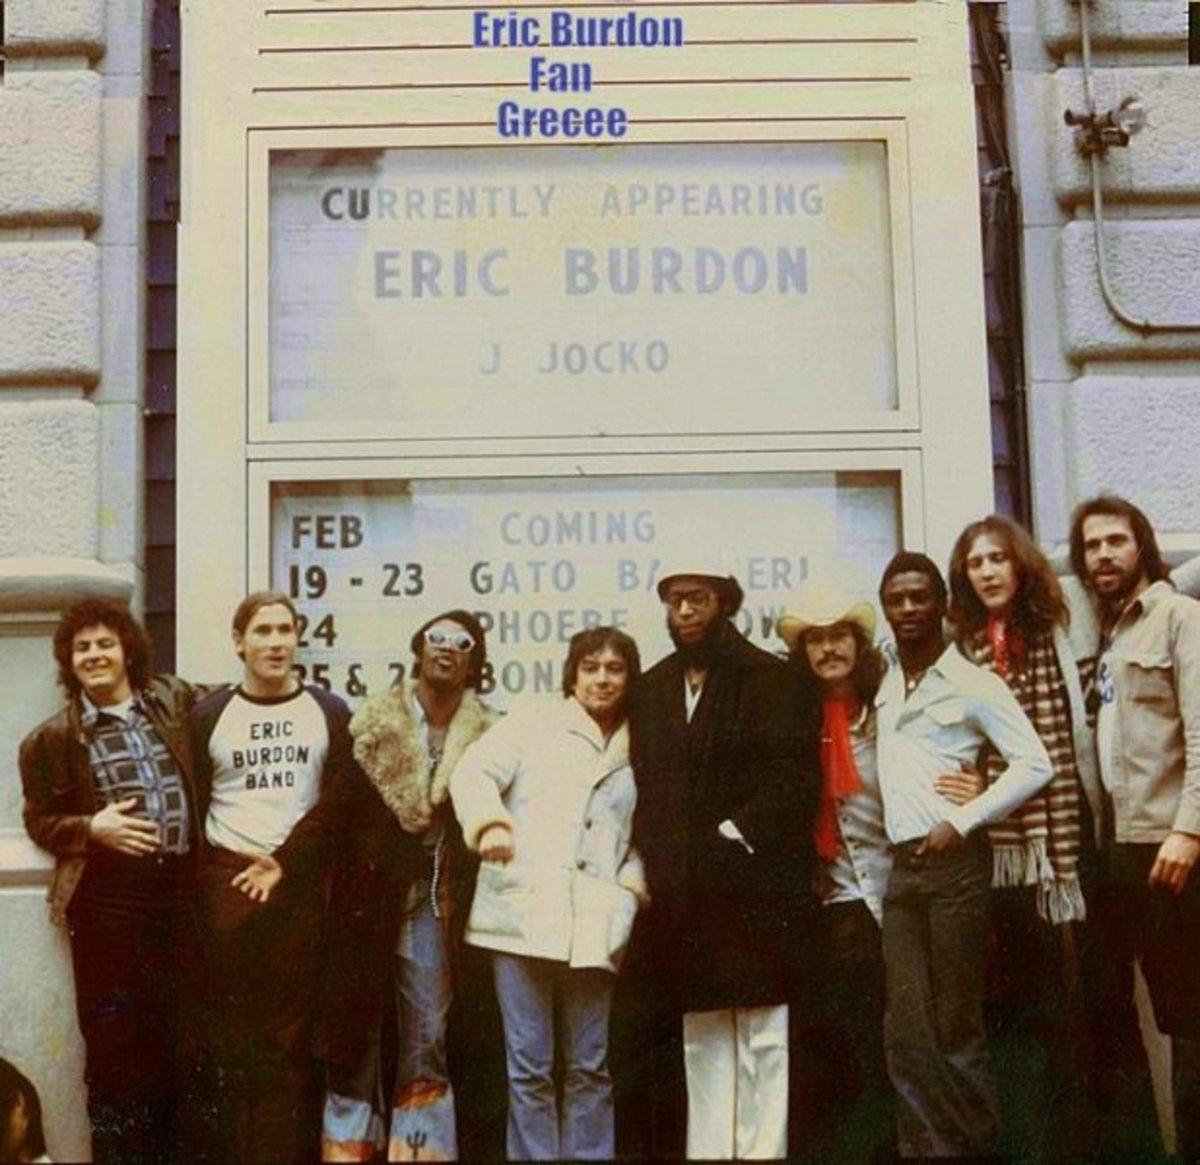 The Eric Burdon Band in 1976